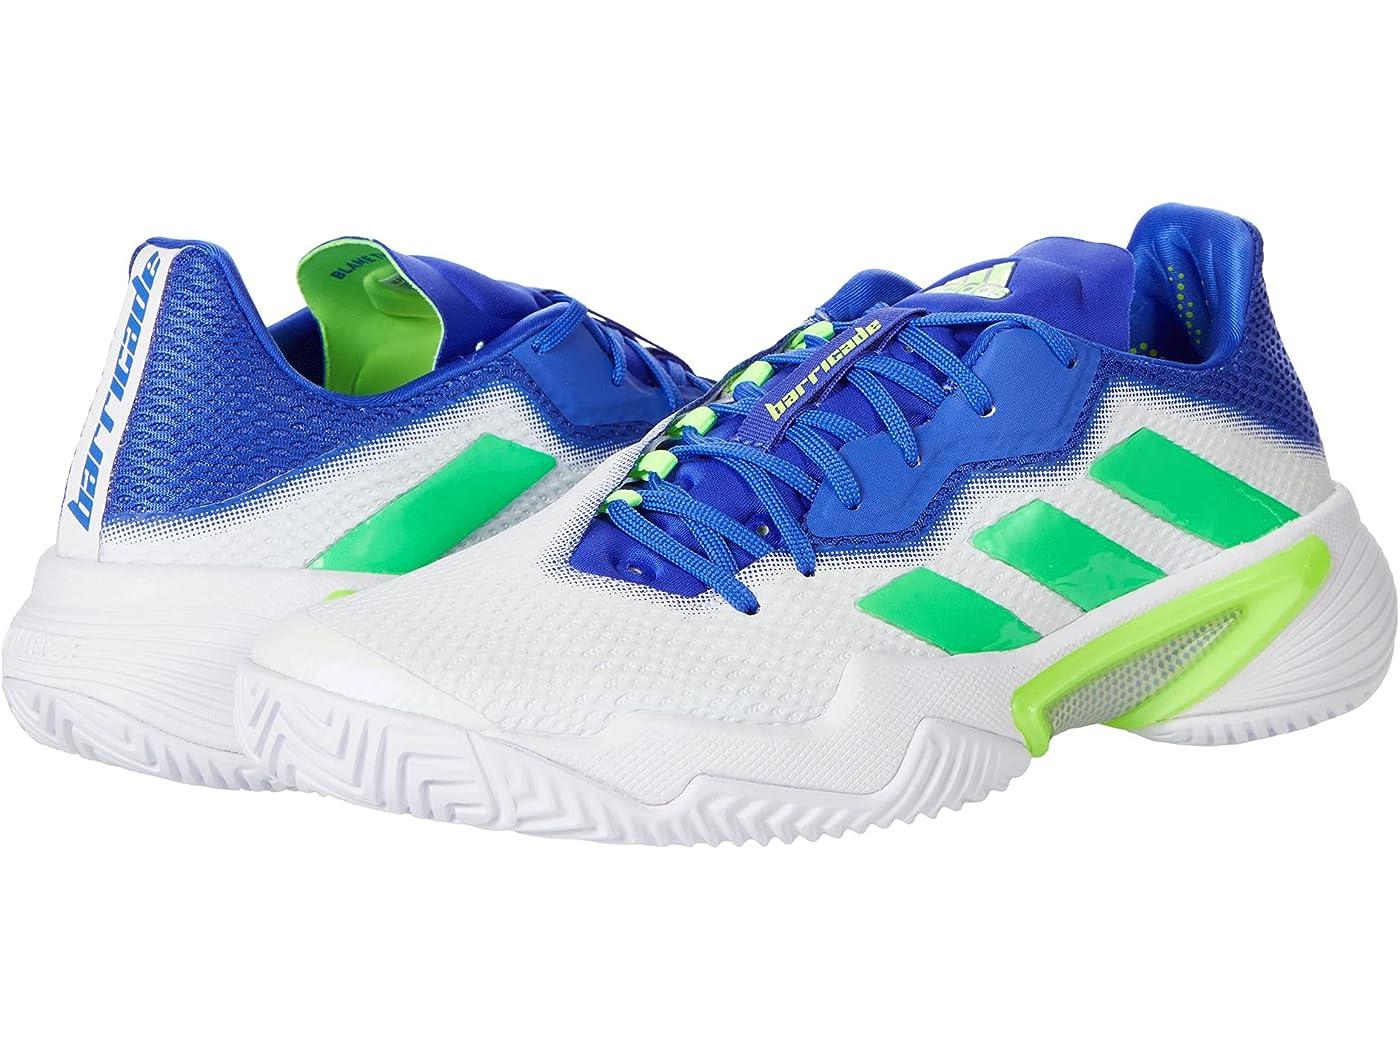 Adidas Barricade 12 Tennis Shoes